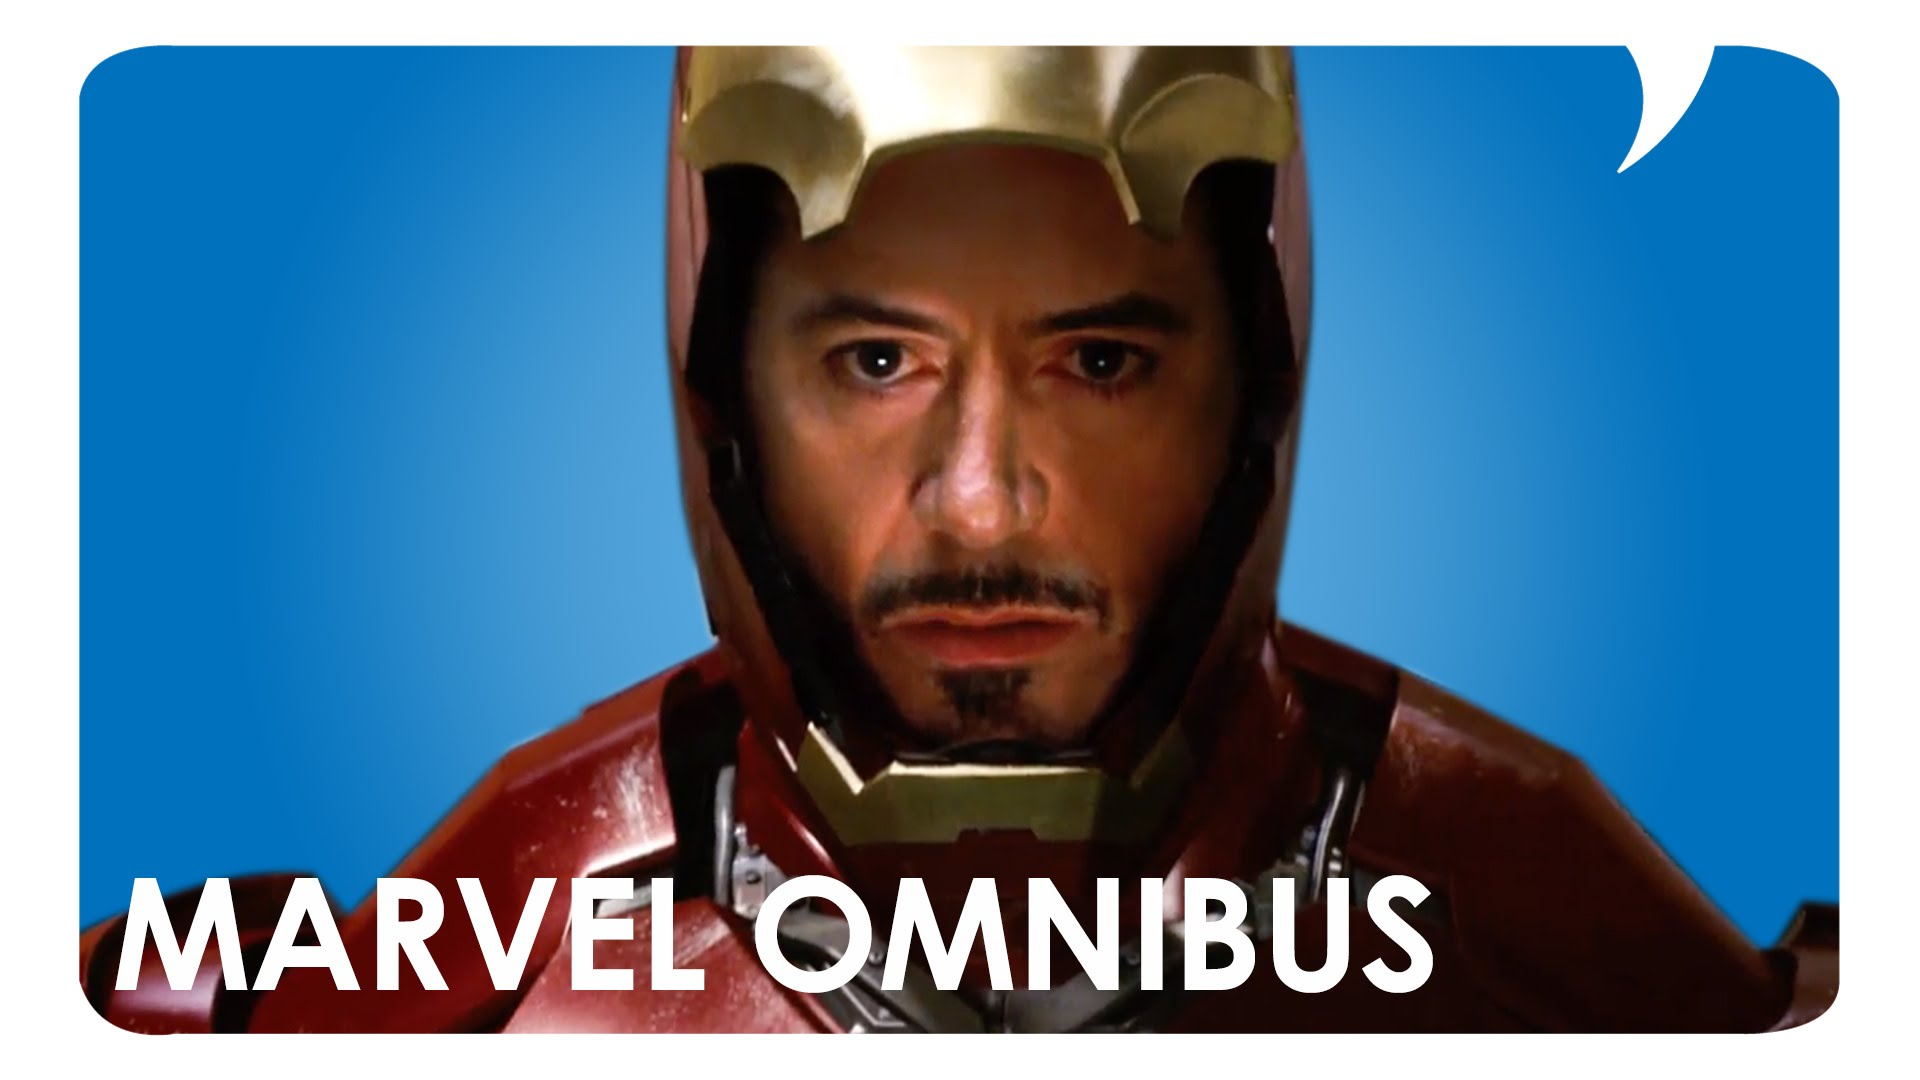 Das Marvel Cinematic Universe in komplett chronologischer Reihenfolge